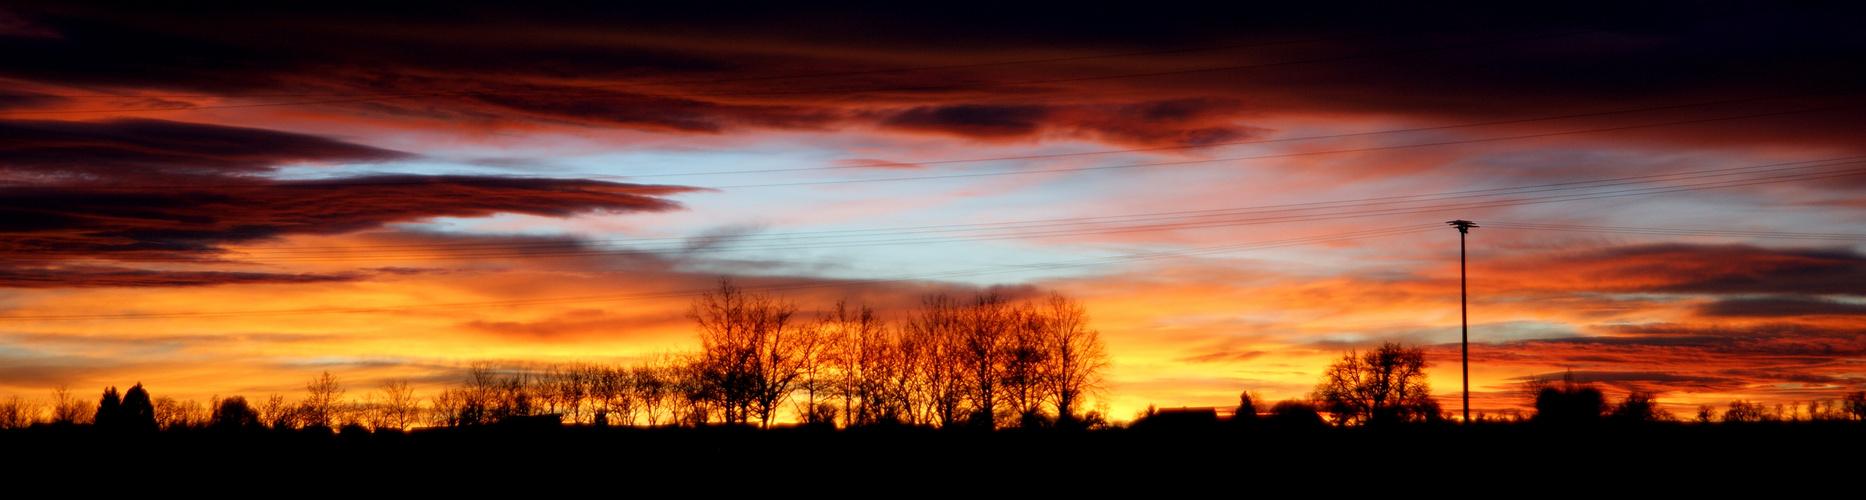 Faszinierender Sonnenuntergang